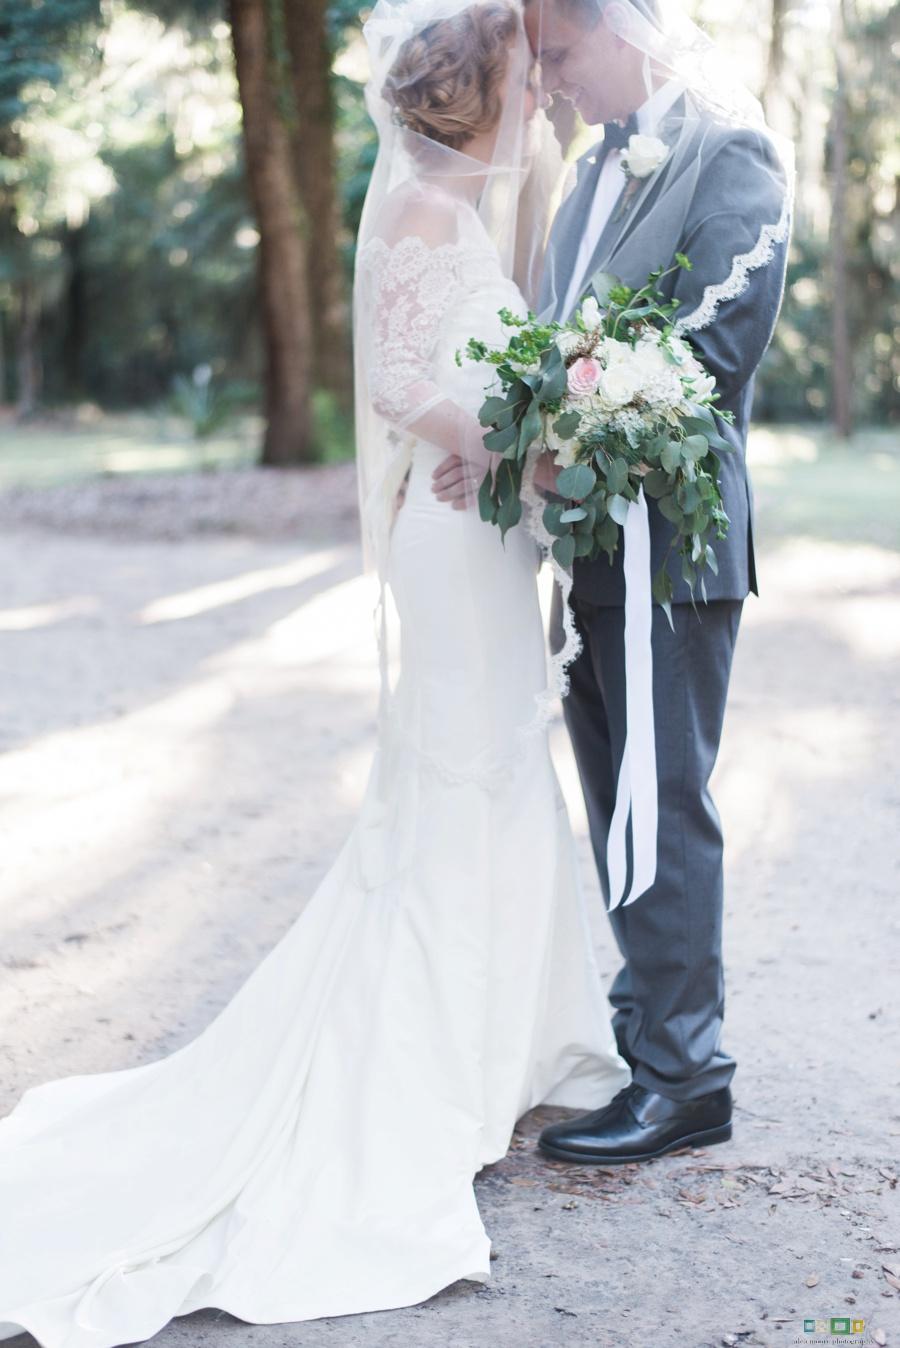 alea-moore-photography-Daufuskie-Island-wedding-ivory-and-beau-bridal-boutique-dakota-nicole-miller-rebecca-schoneveld-marisol-classic-southern-wedding-savannah-wedding-dresses-savannah-bridal-boutique-savannah-weddings-savannah-bridal-gowns-6.jpg